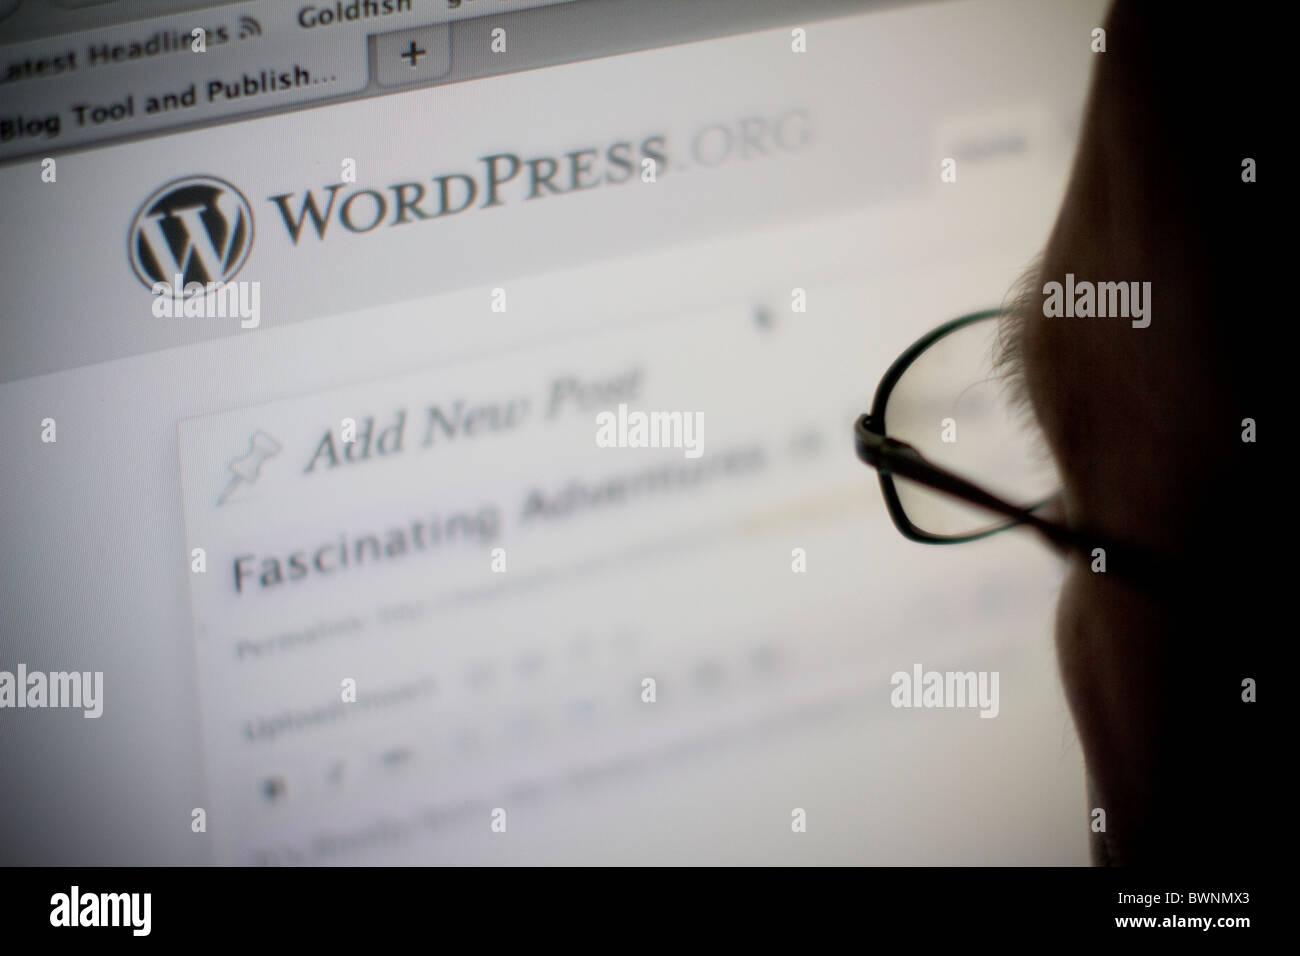 internet browser viewing wordpress website - Stock Image